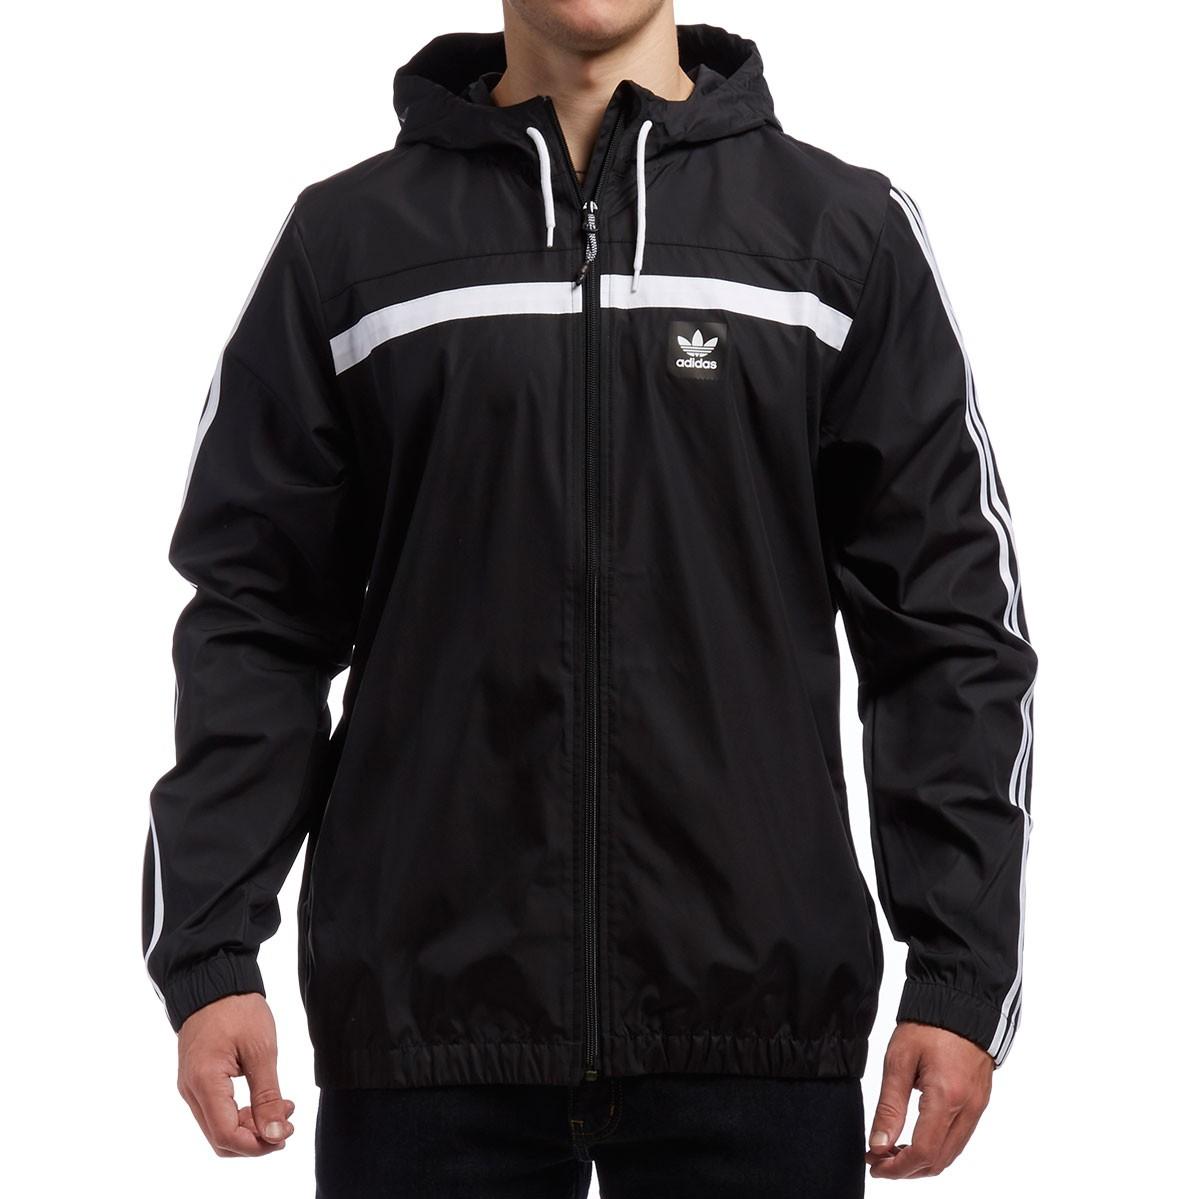 adidas windbreaker 2 jacket - black/white UEUJSPD